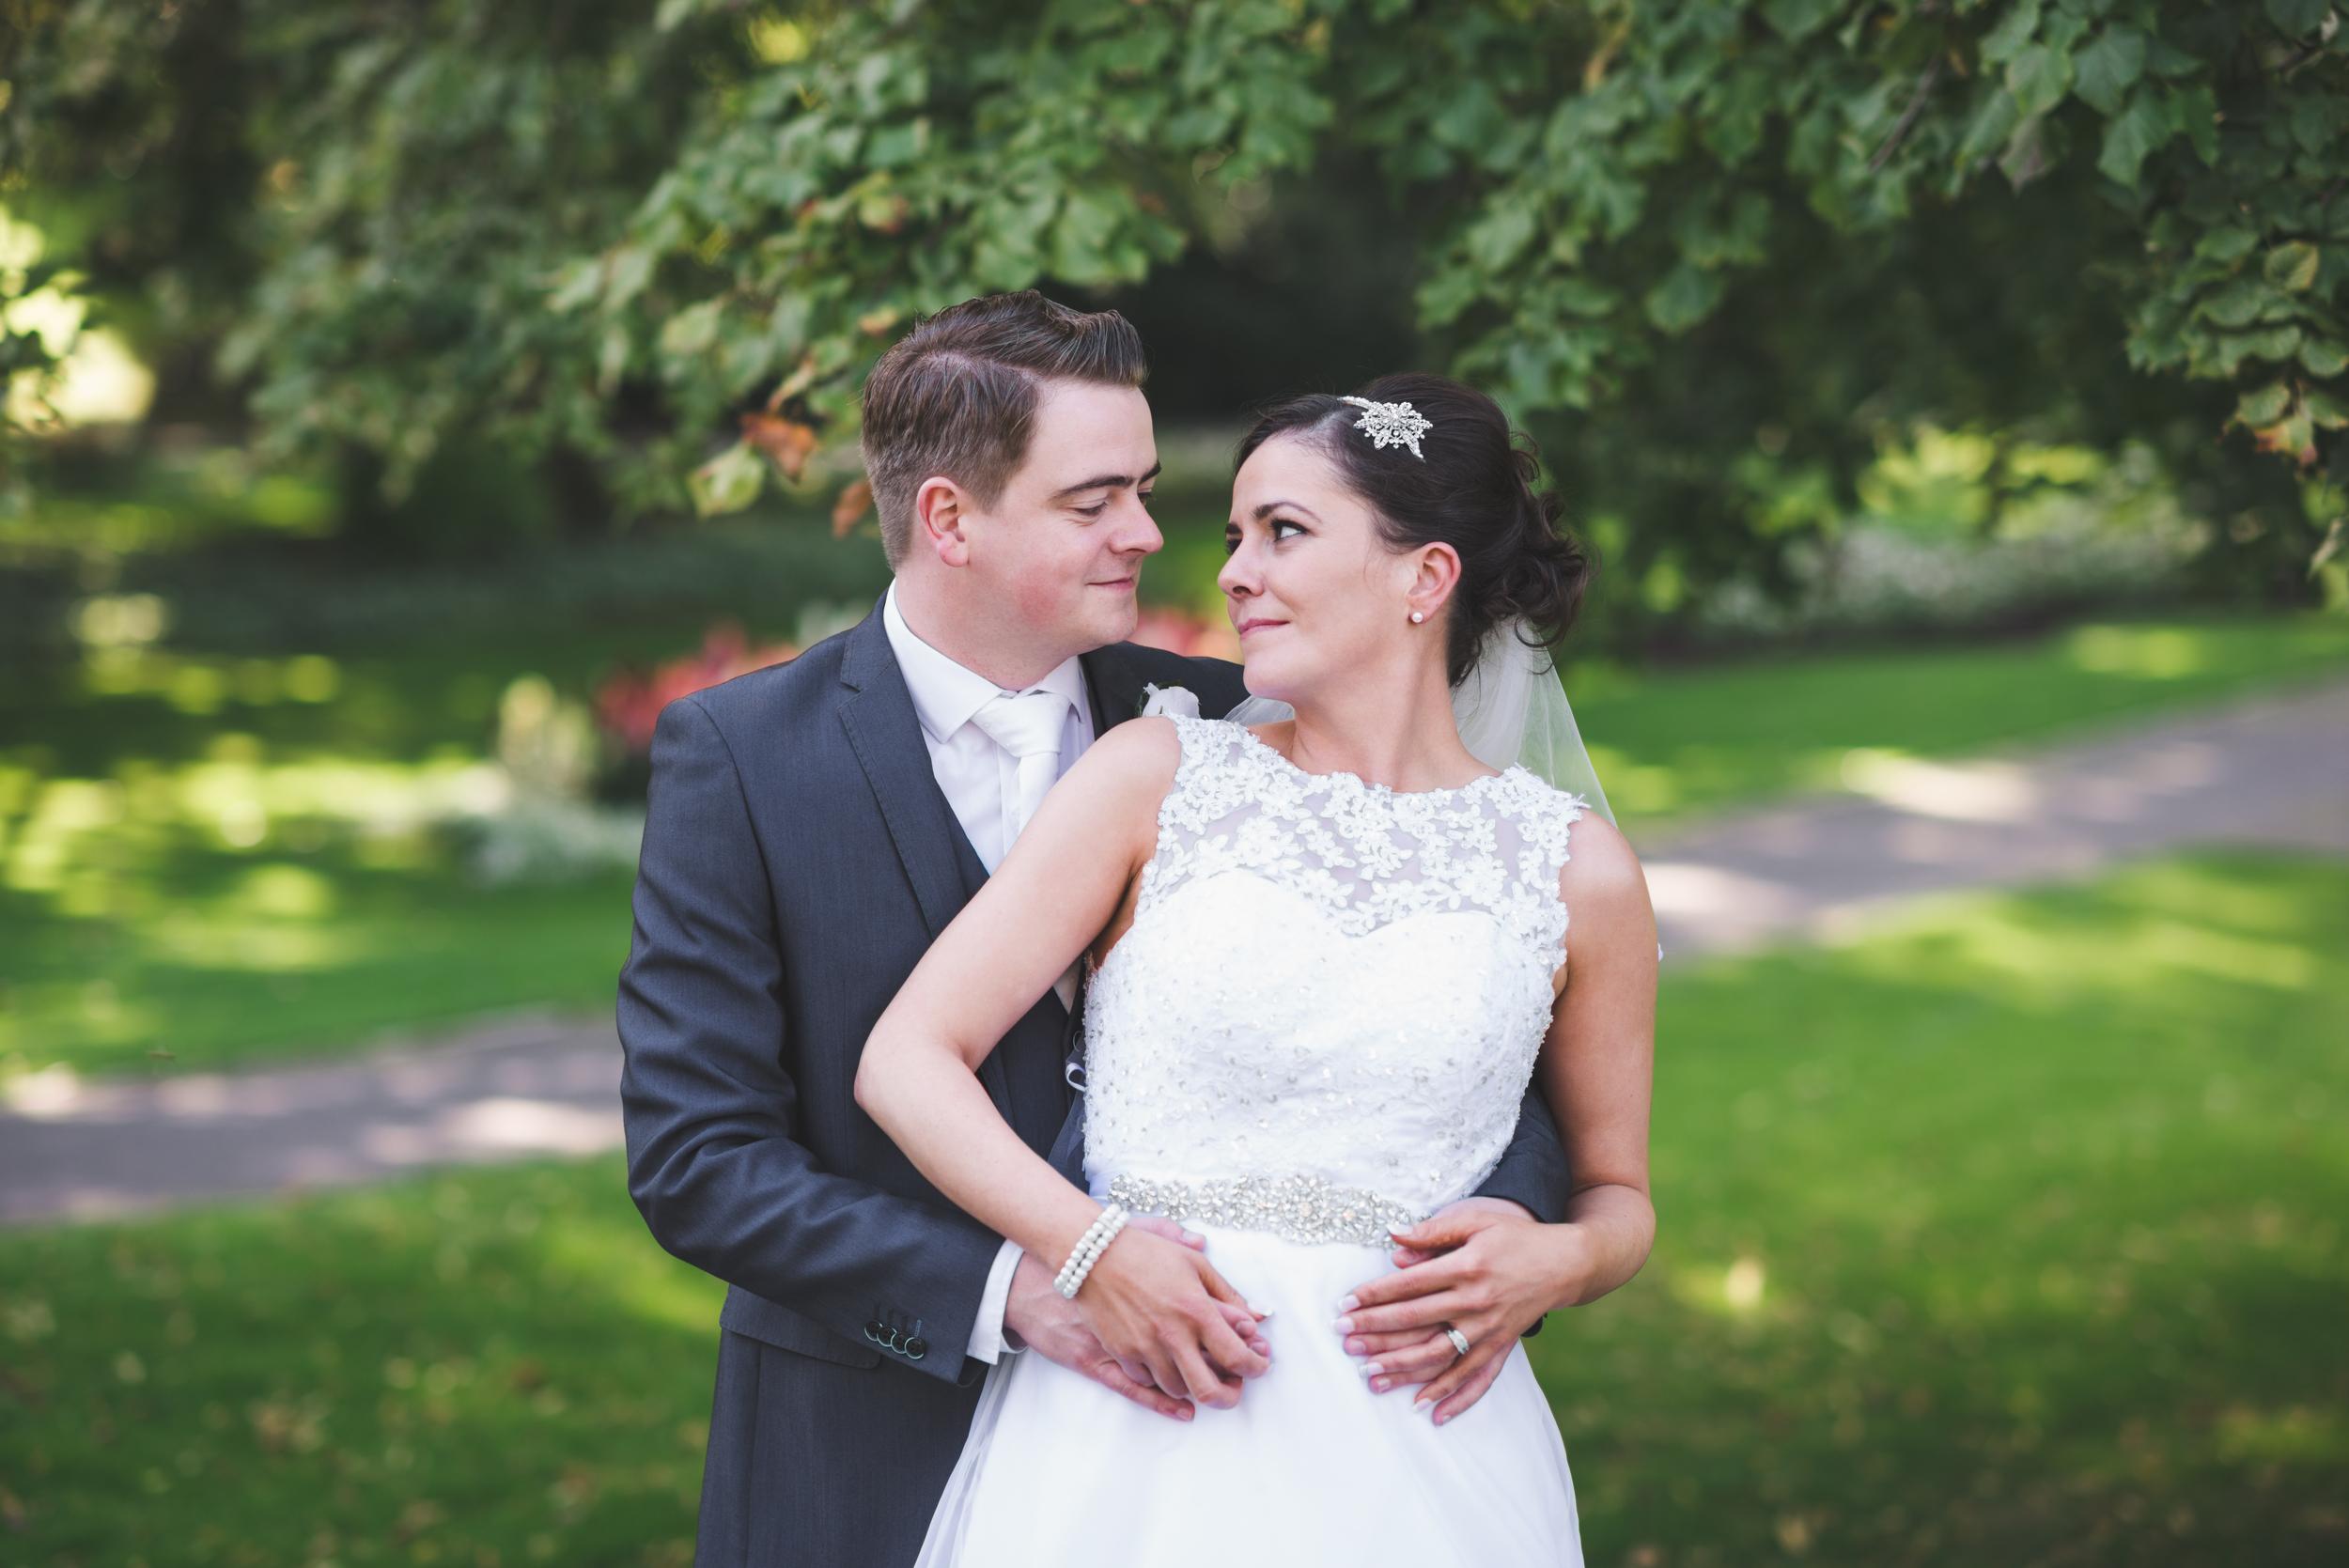 Belfast_Wedding_Photographer_Purephotoni_Musgrave_Park_Bride_and_Groom_Love